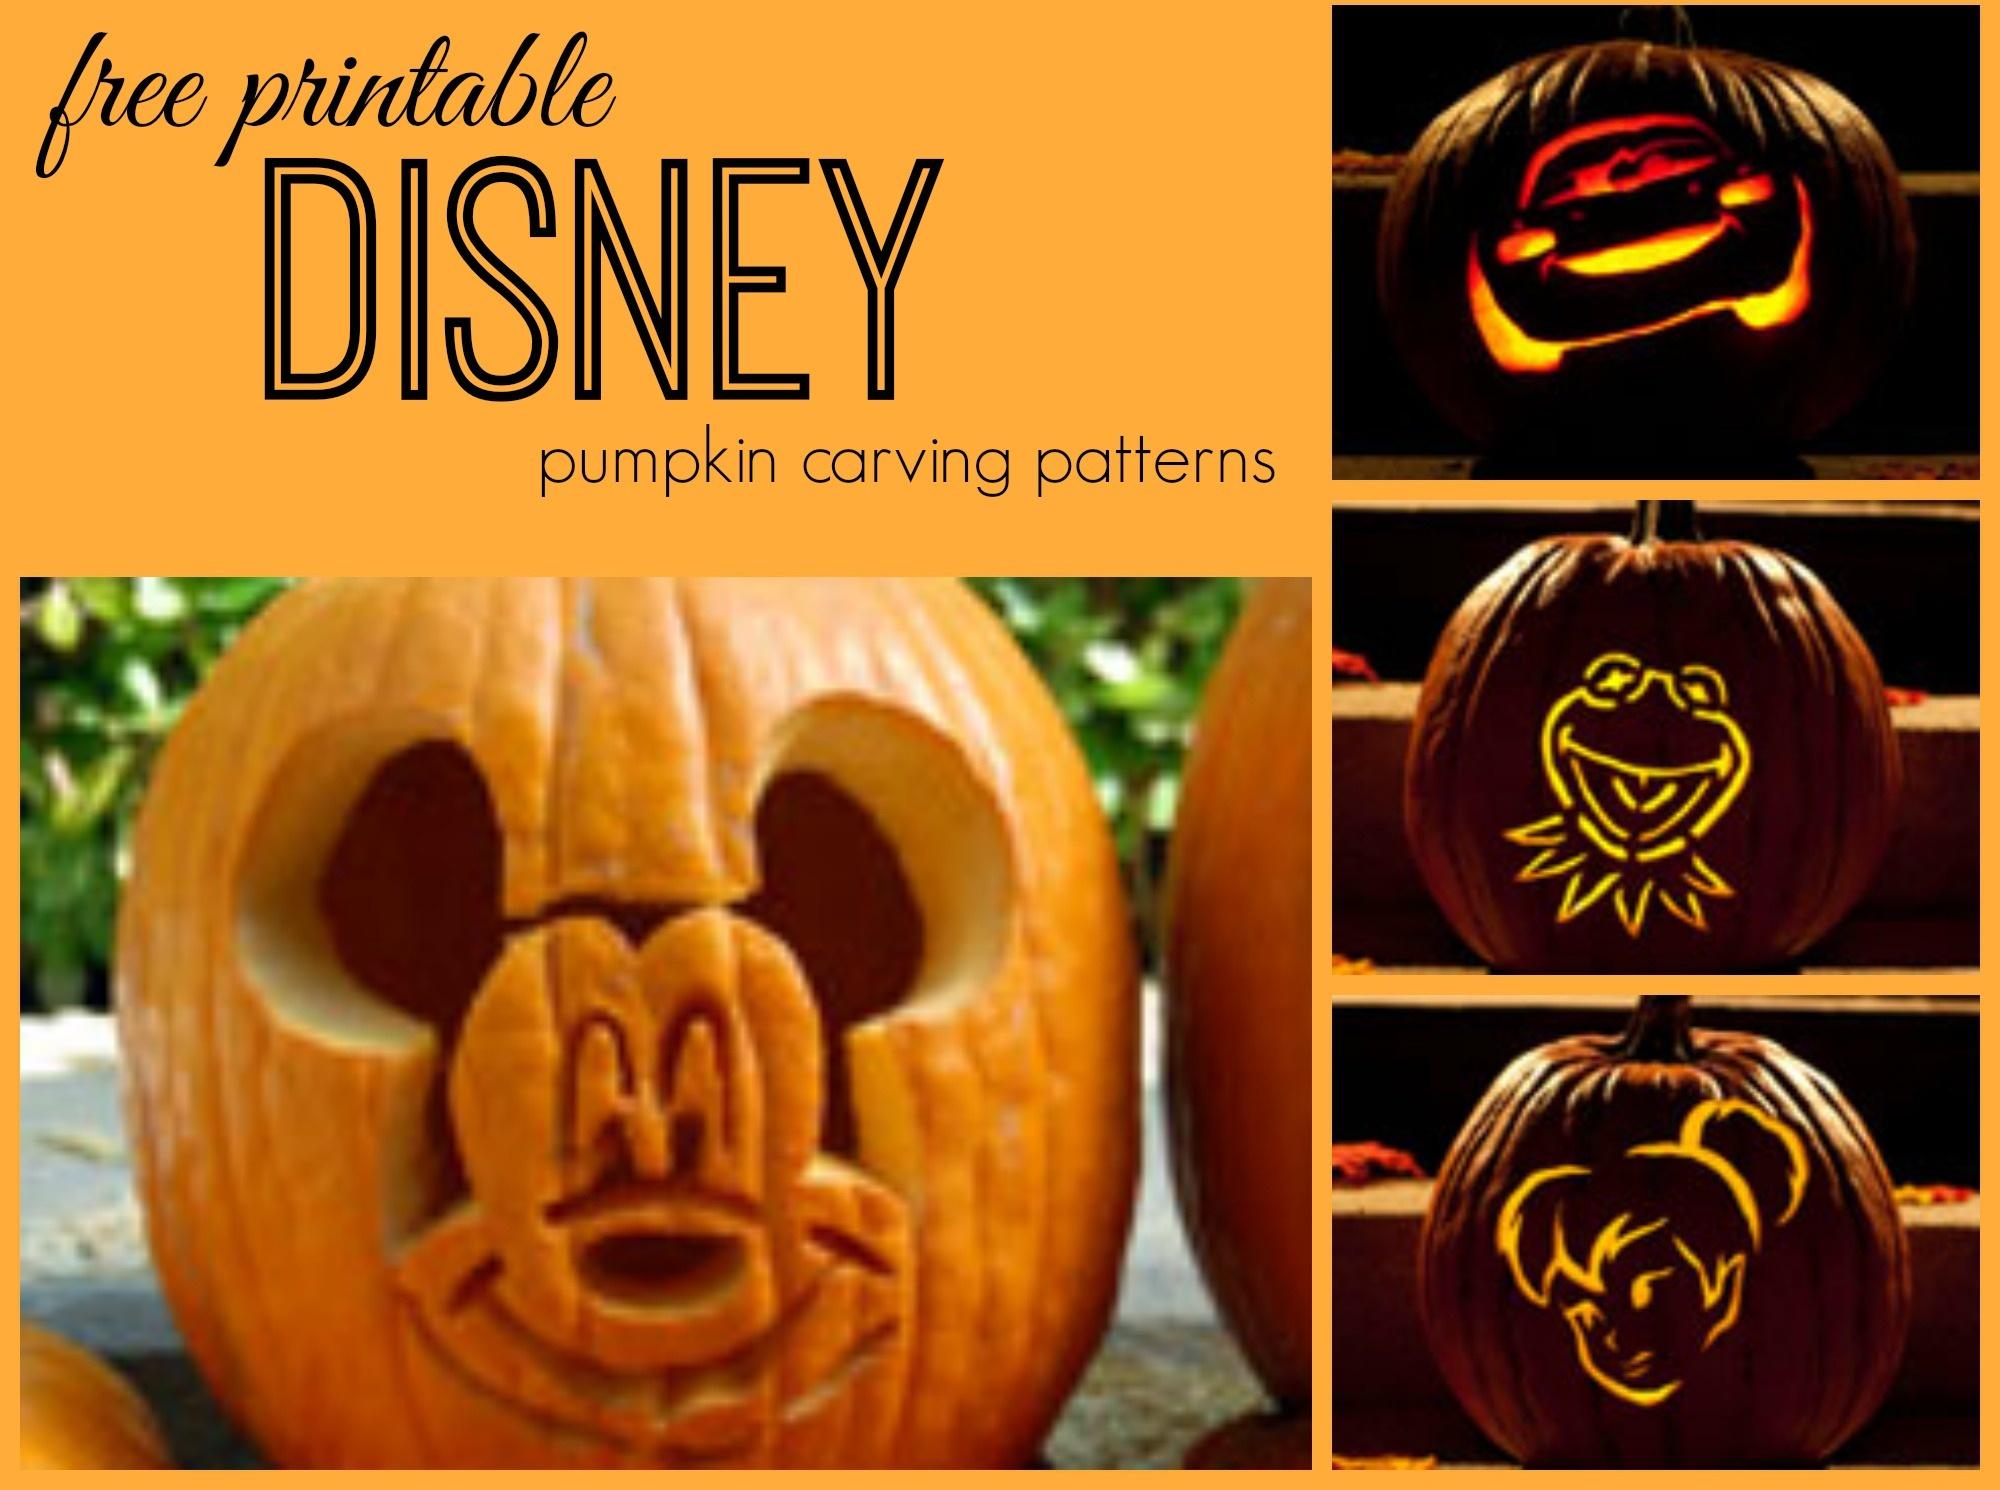 Disney Pumpkin Carving Patterns - Frugal Fanatic - Free Printable Lightning Mcqueen Pumpkin Stencil